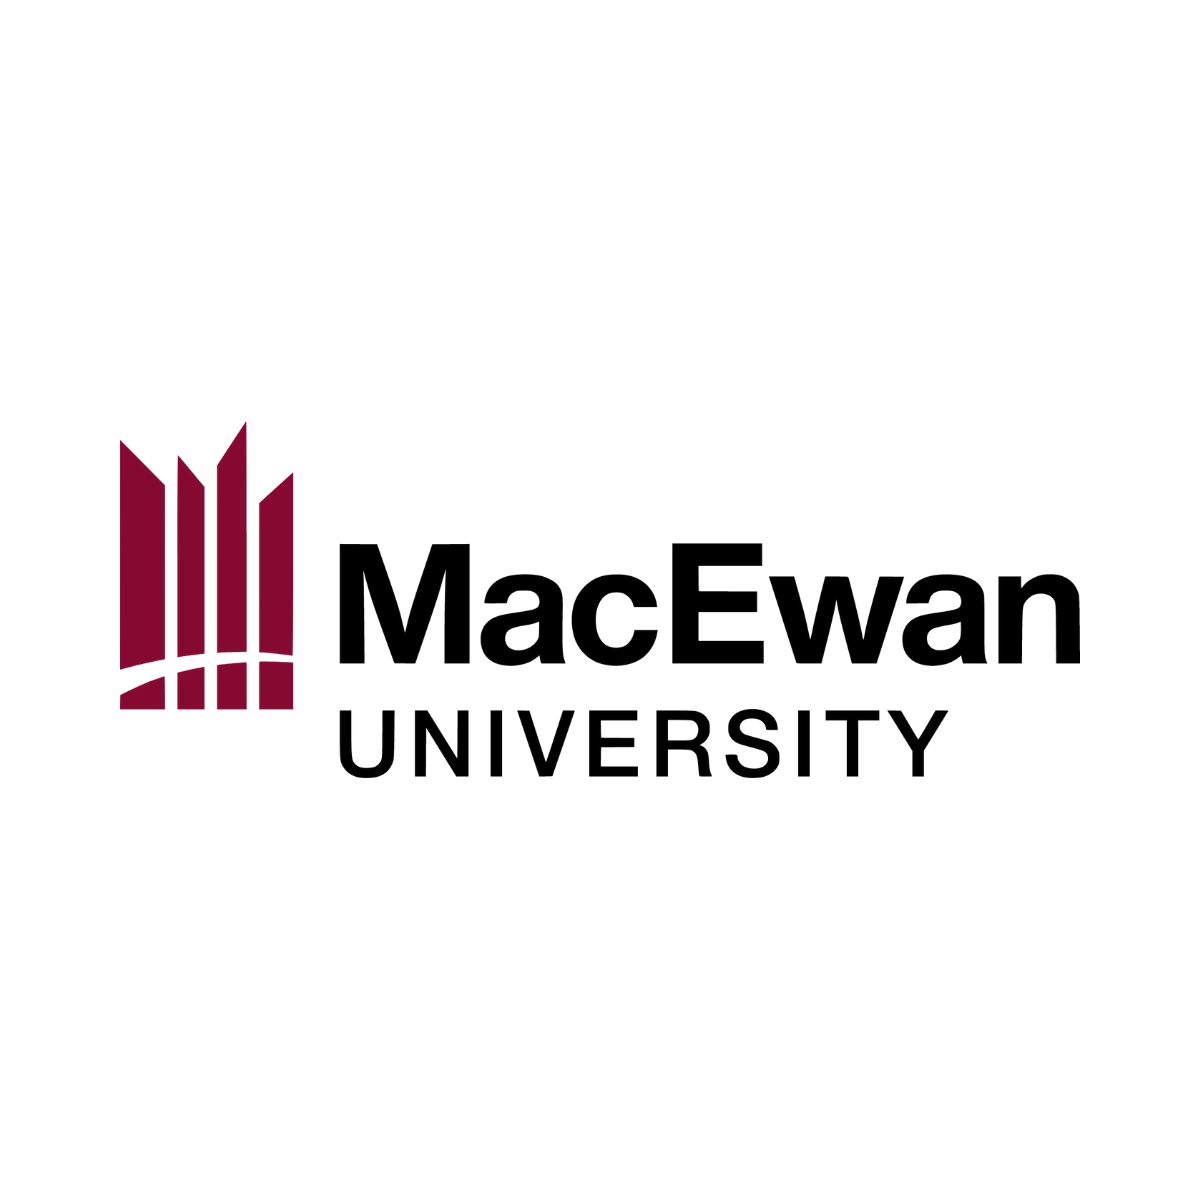 MacEwan University Logo Image